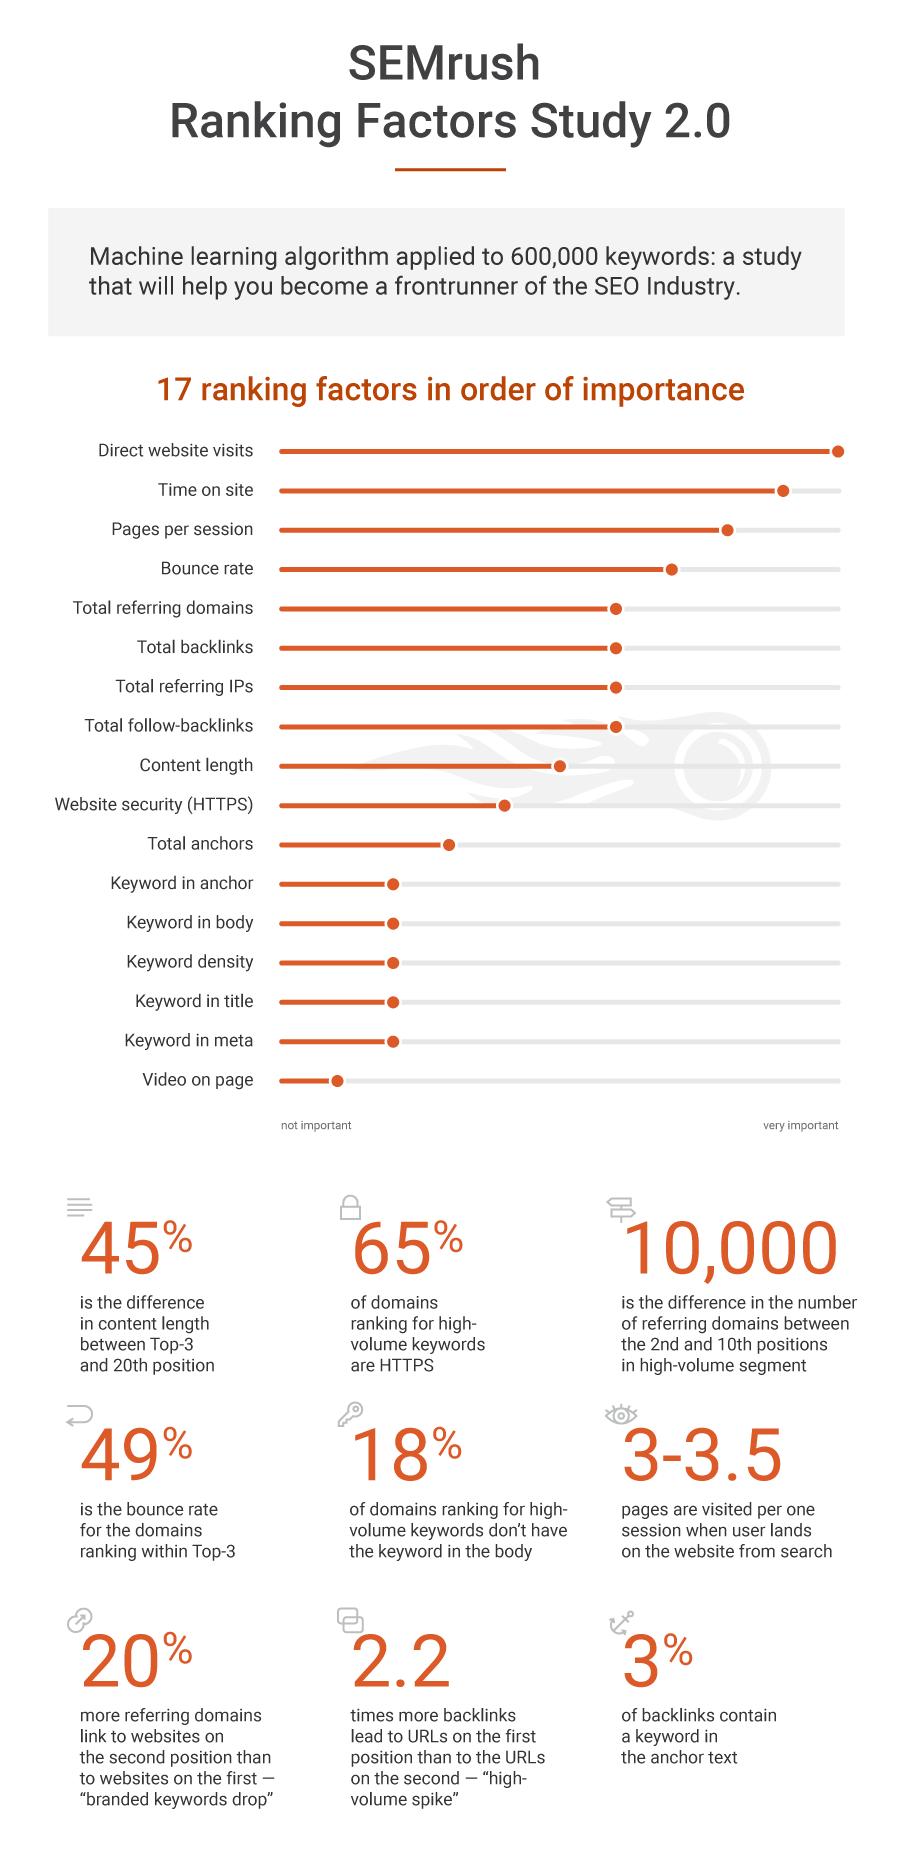 infographie-ranking-factors-new